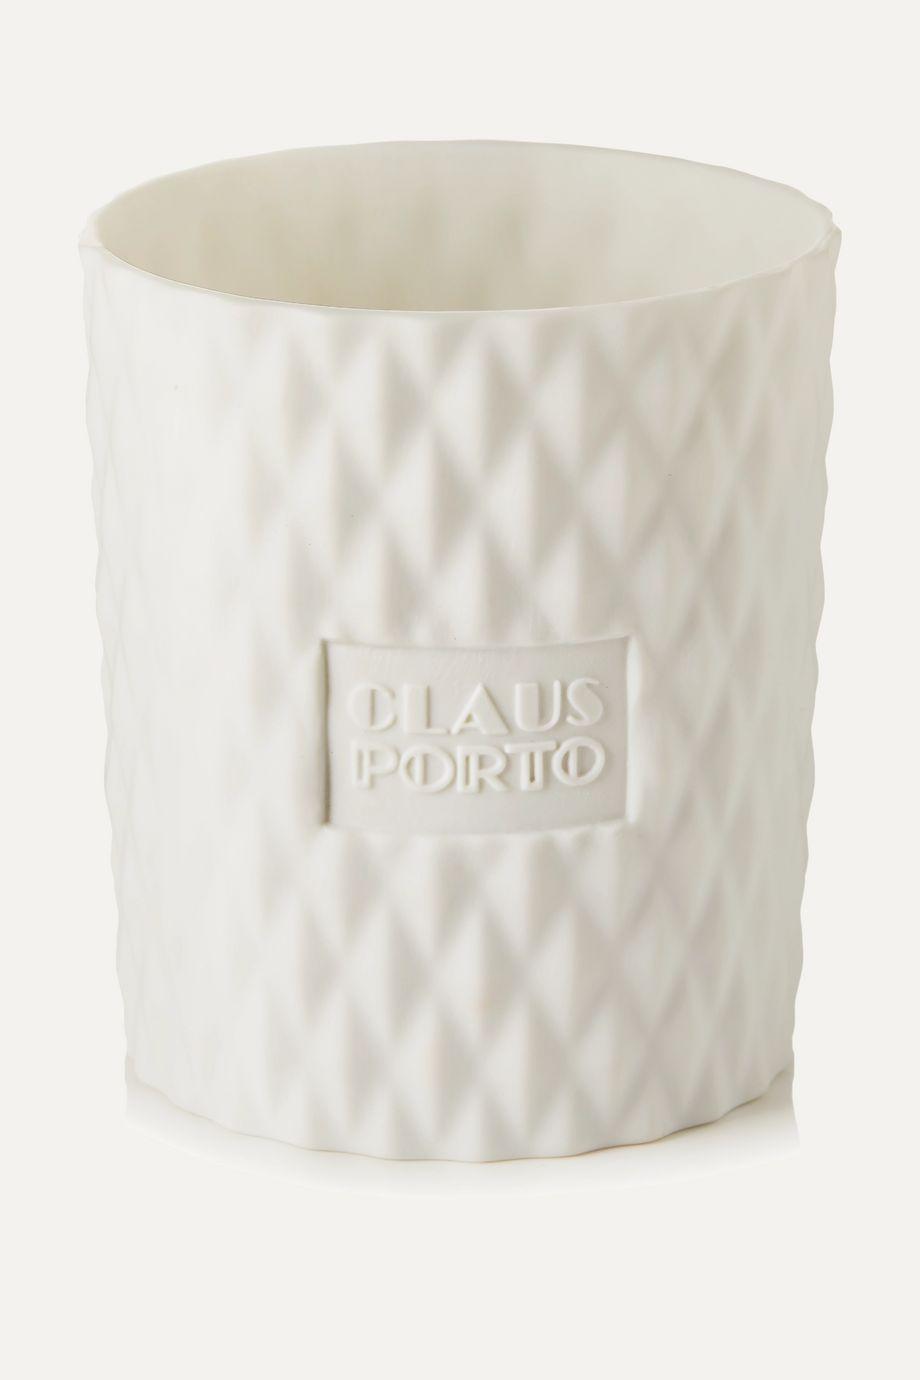 Claus Porto Chypre Cedar Poinsettia scented candle, 270g